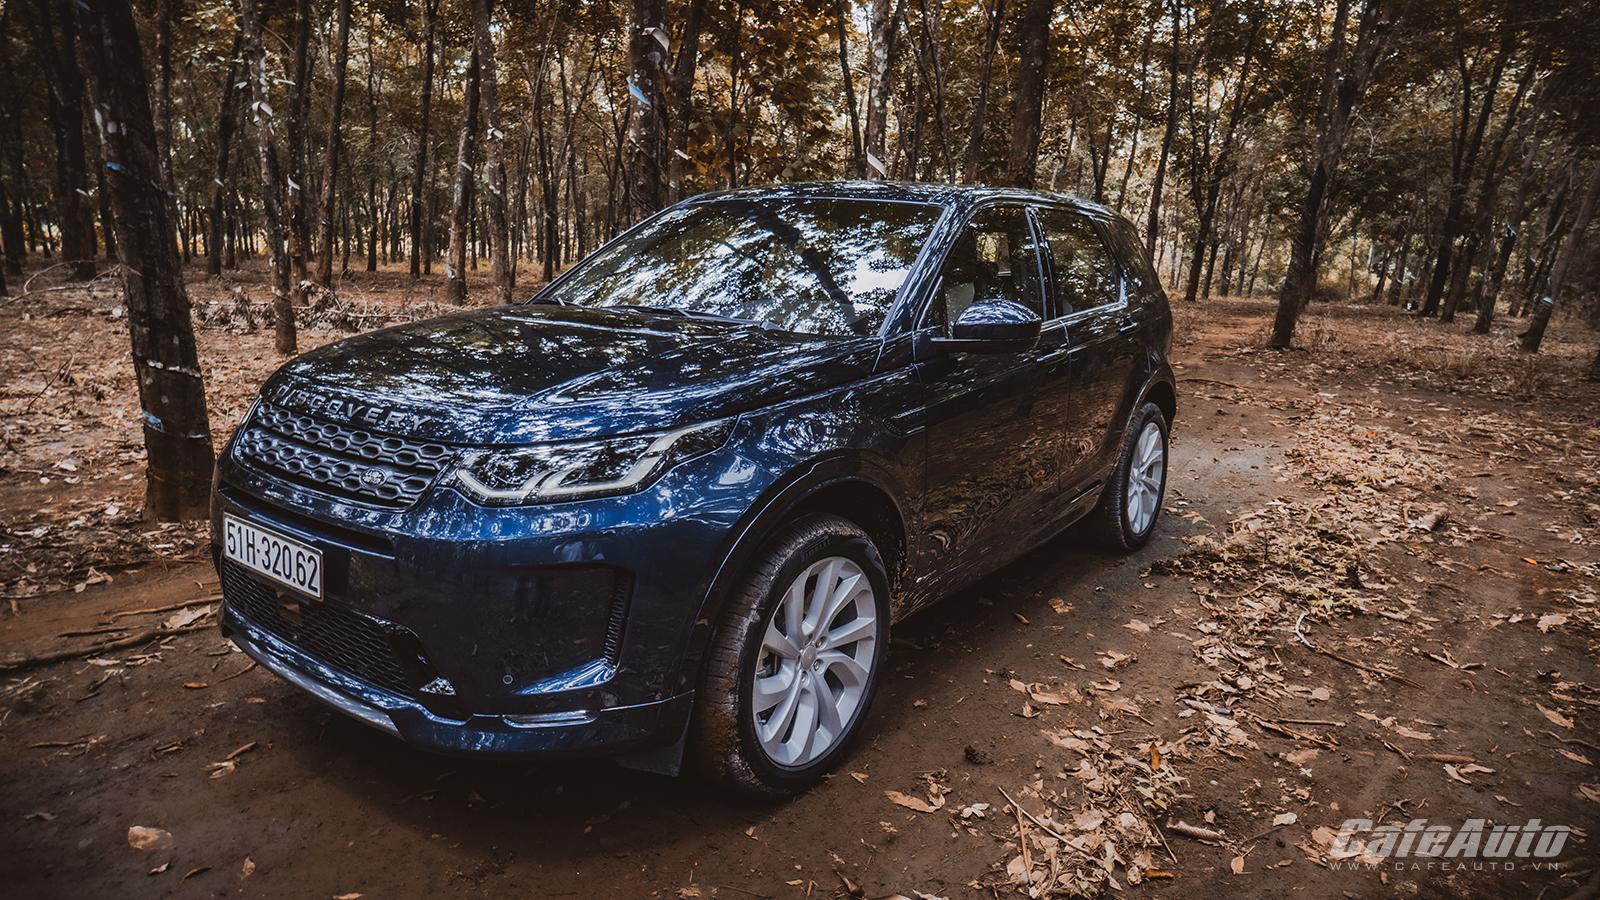 danh-gia-land-rover-discovery-sport-mon-chinh-trong-bua-tiec-sang